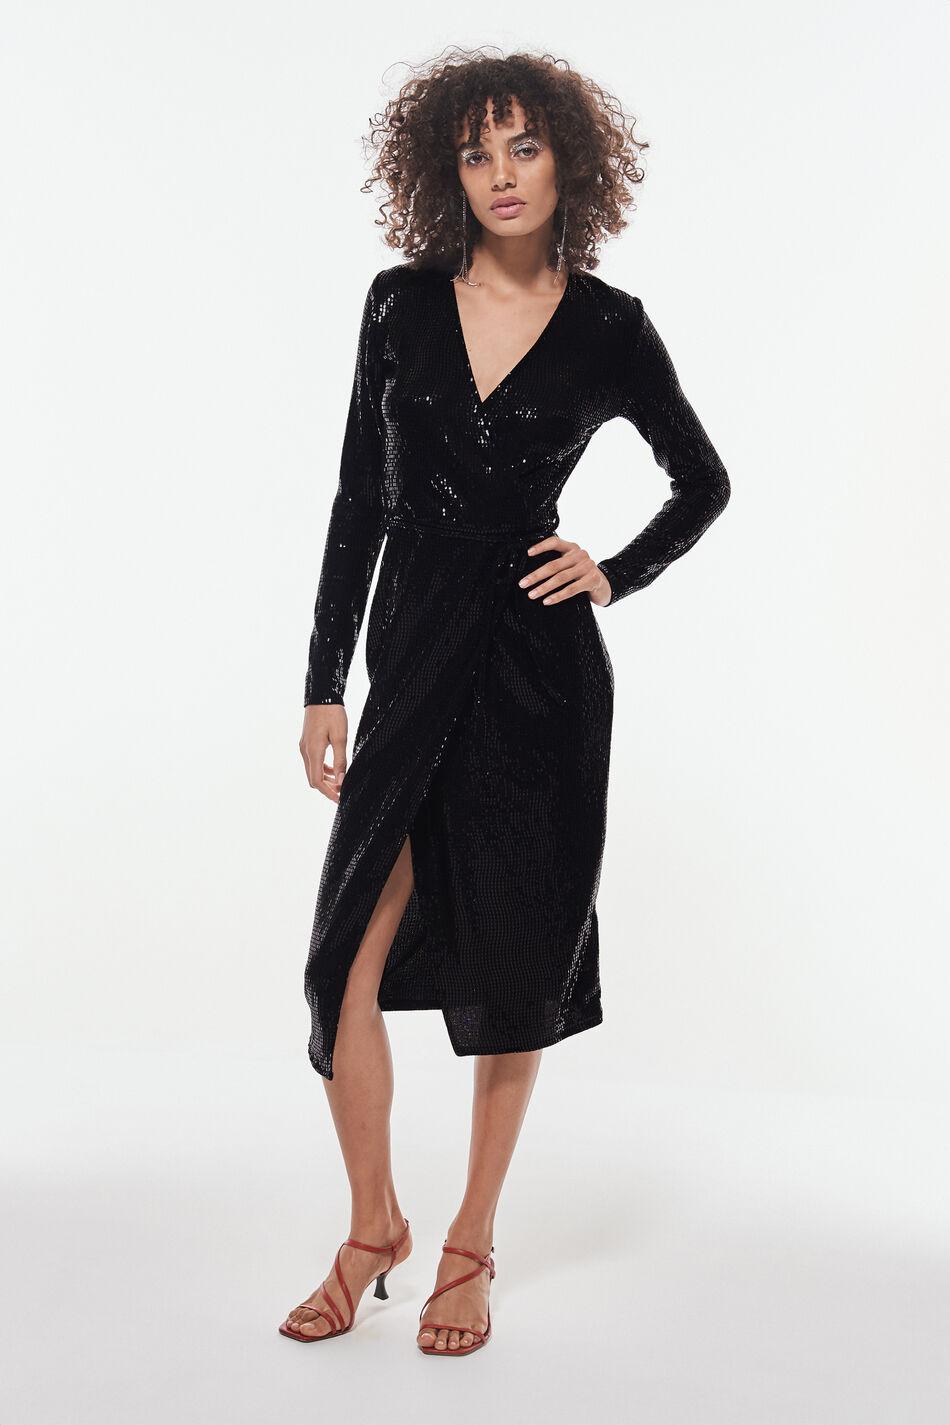 Gina Tricot Sabrina dress